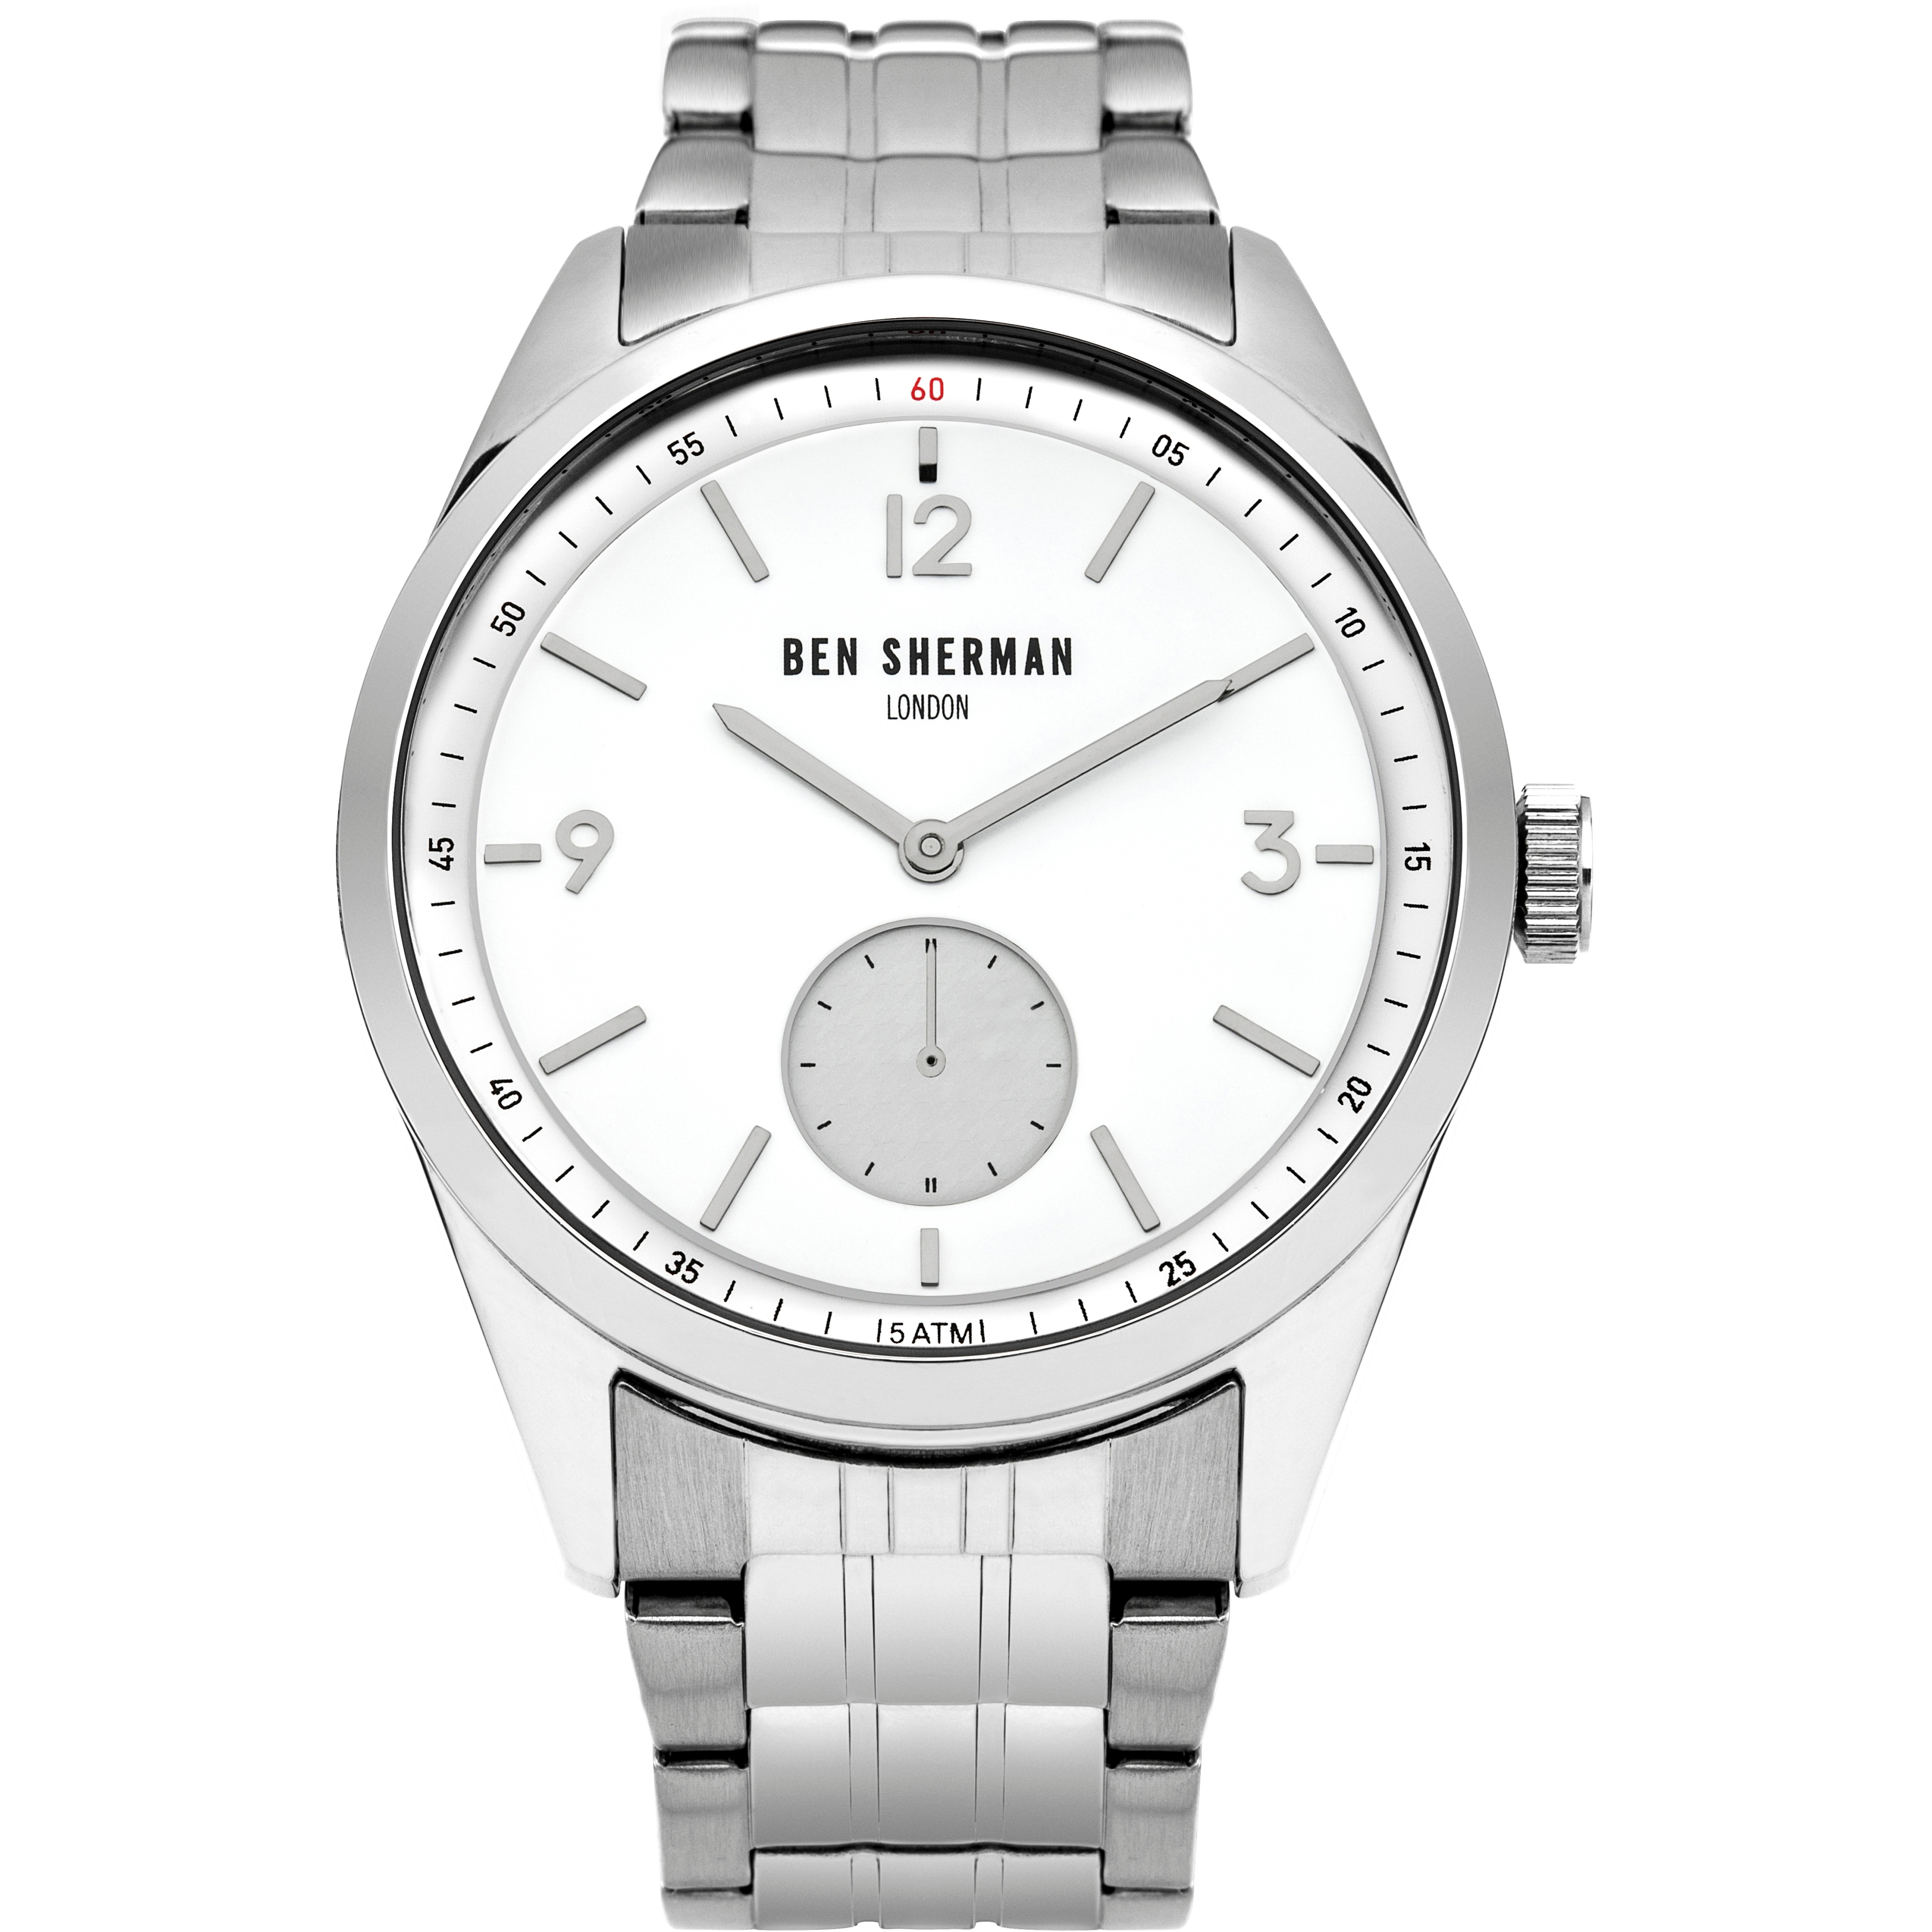 c52258eb Gents Ben Sherman London Carnaby Driver Watch (WB052SM) | WatchShop.com™